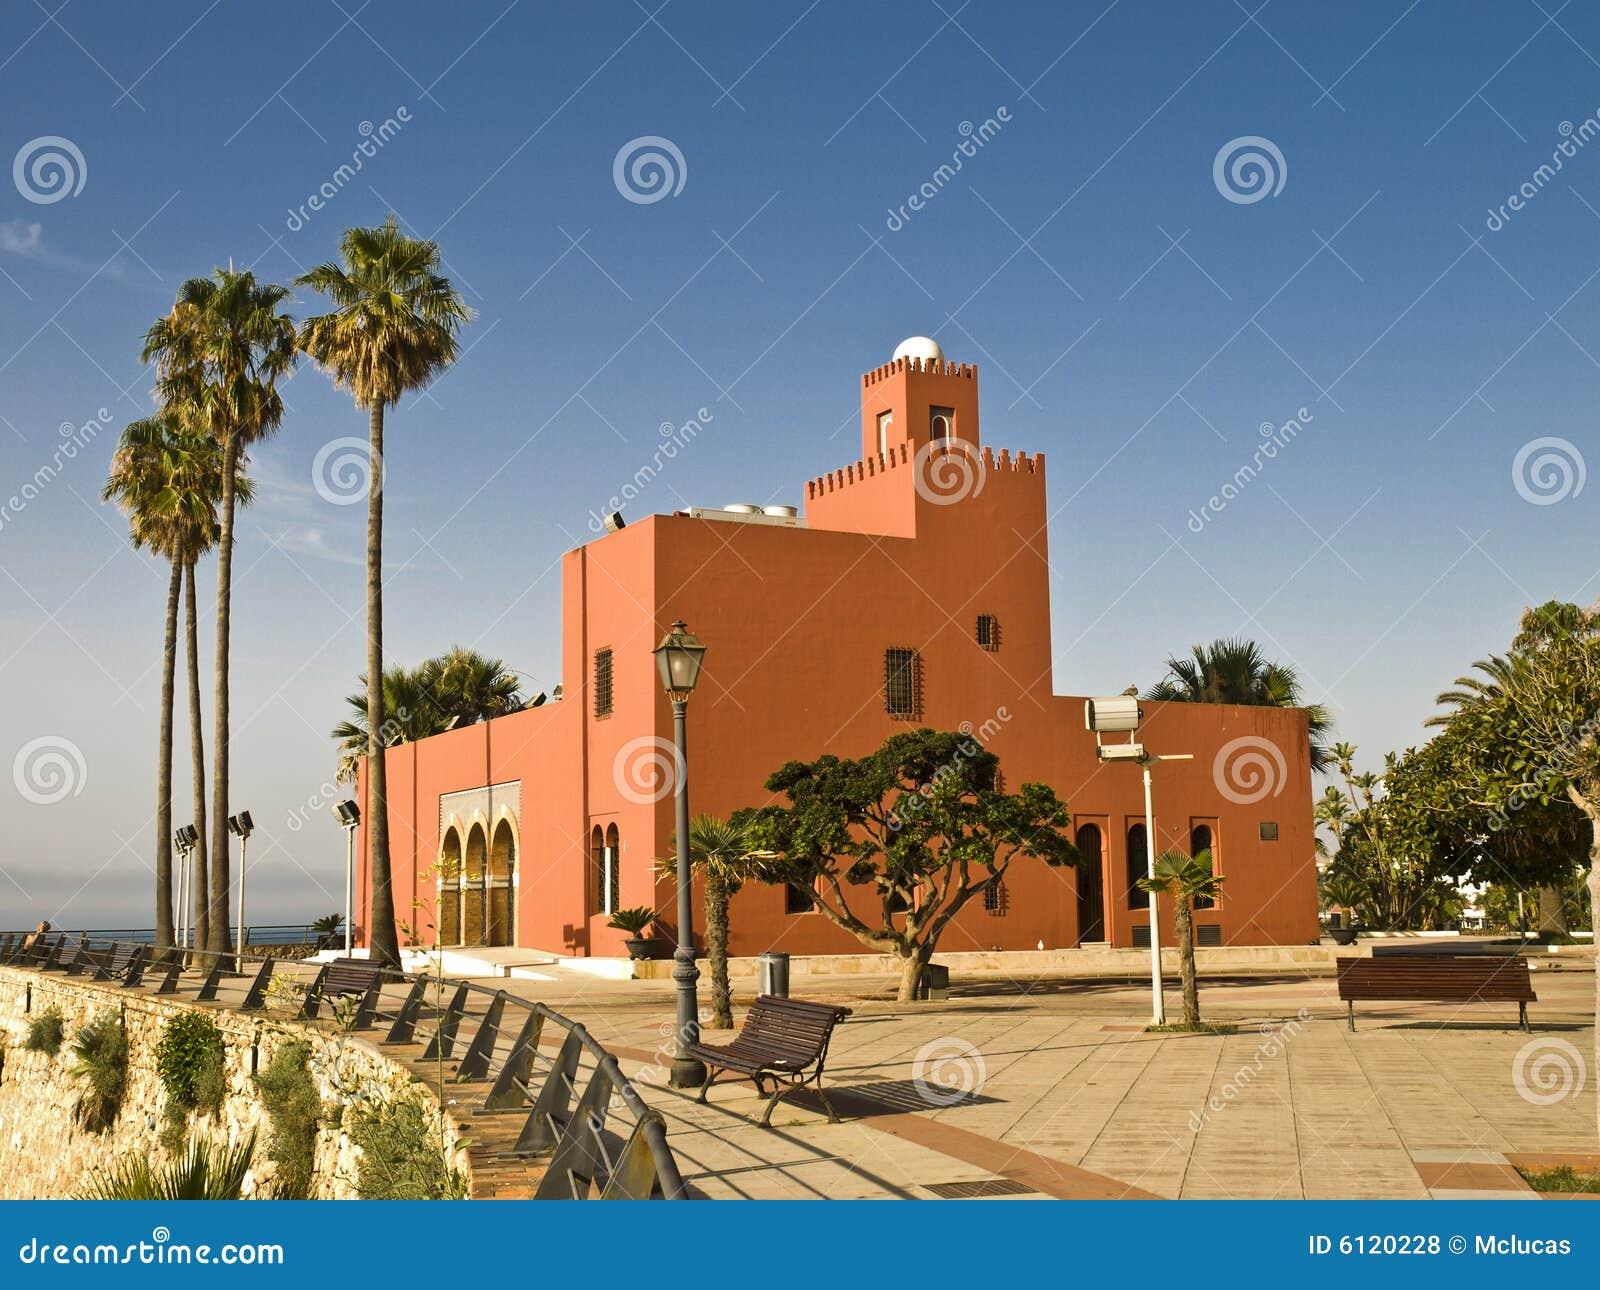 Castillo de bilbil benalmadena